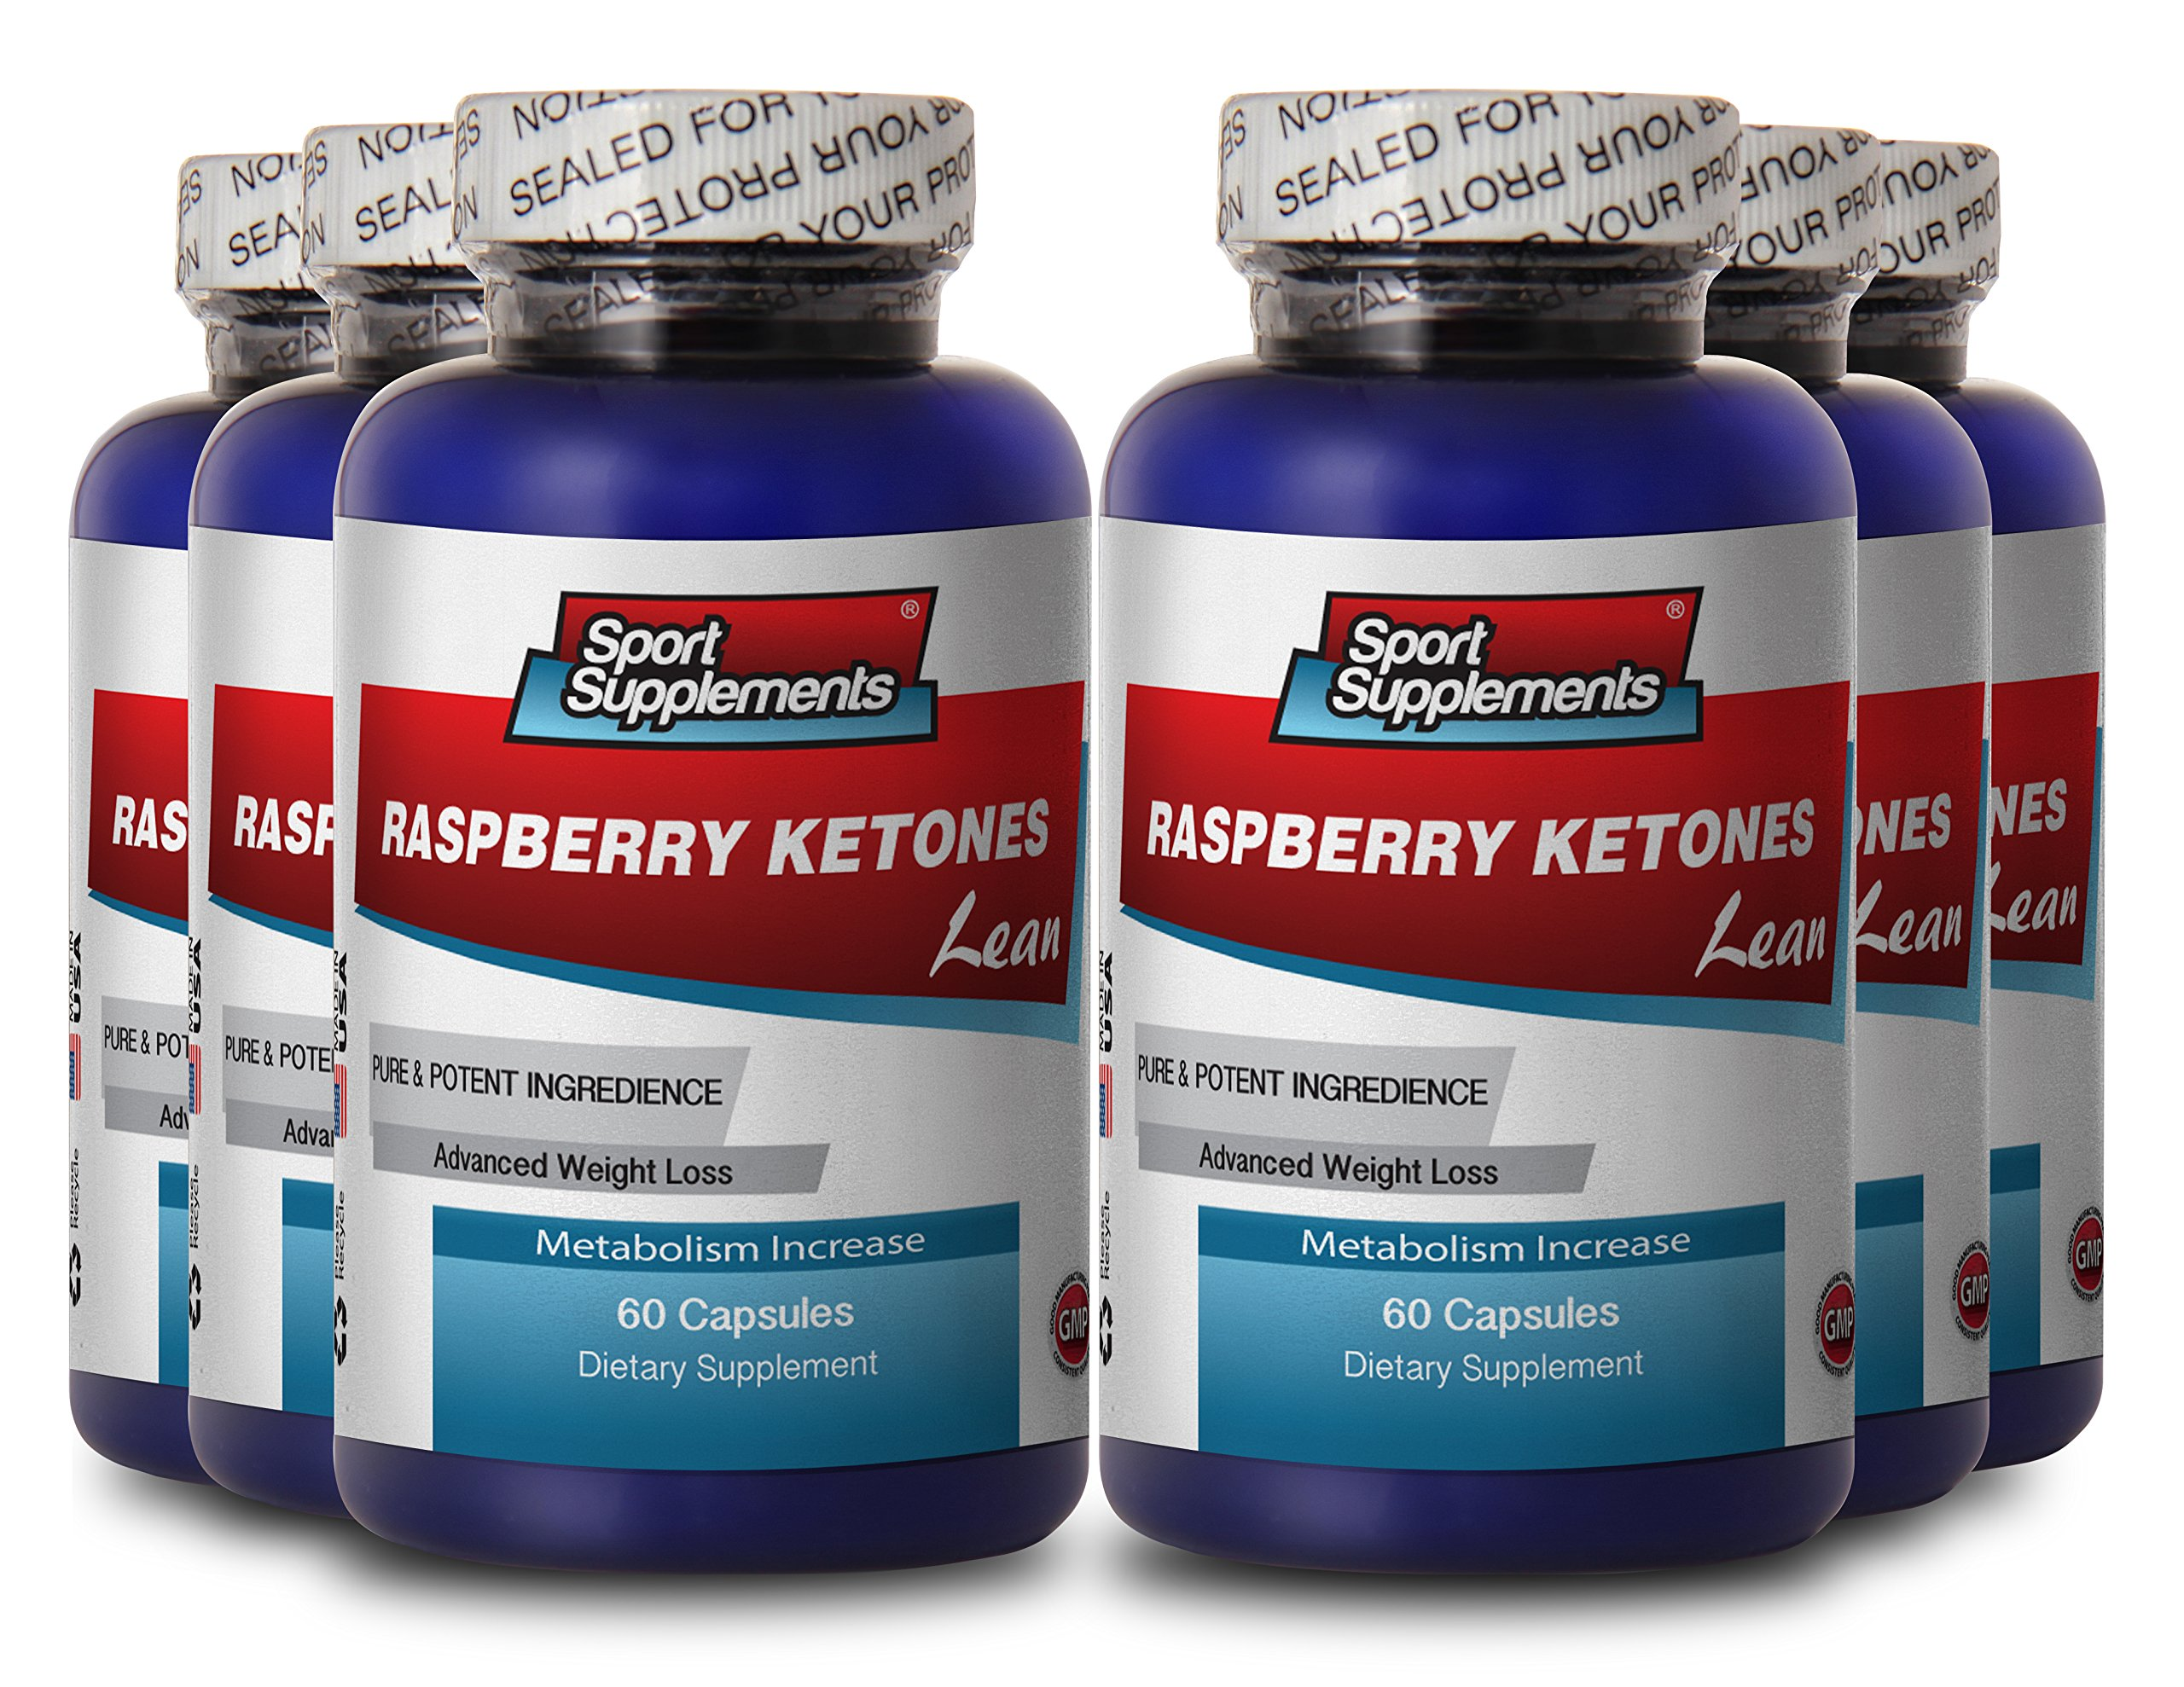 Raspberry Ketones Lean 1200mg w/ Acai, Green Tea, Resveratrol (6 Bottles 360 Capsules)